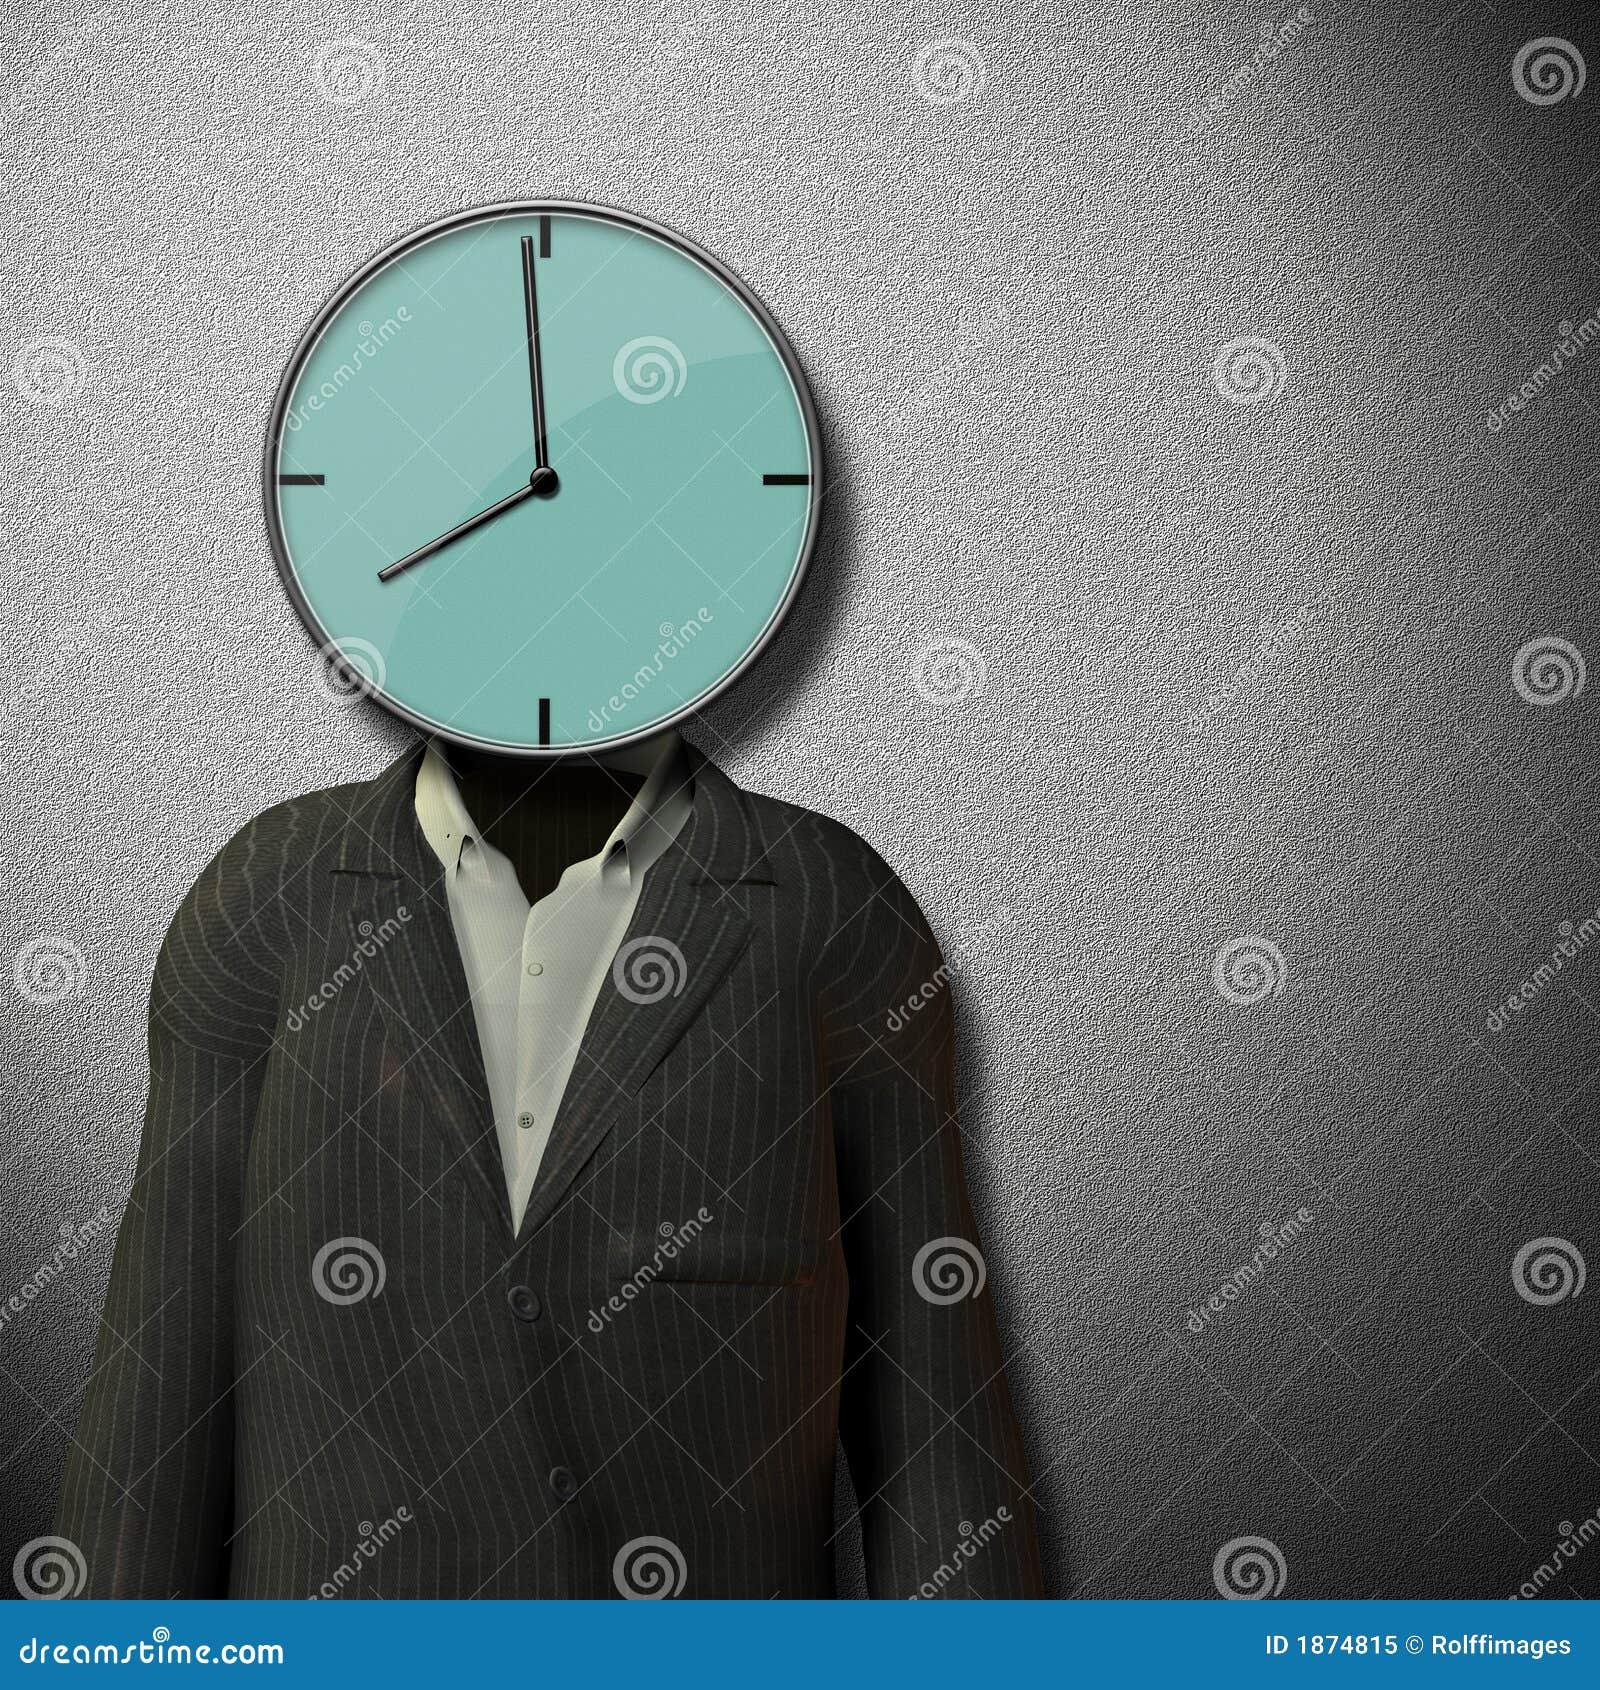 8-o-clock-start-work-day-1874815.jpg